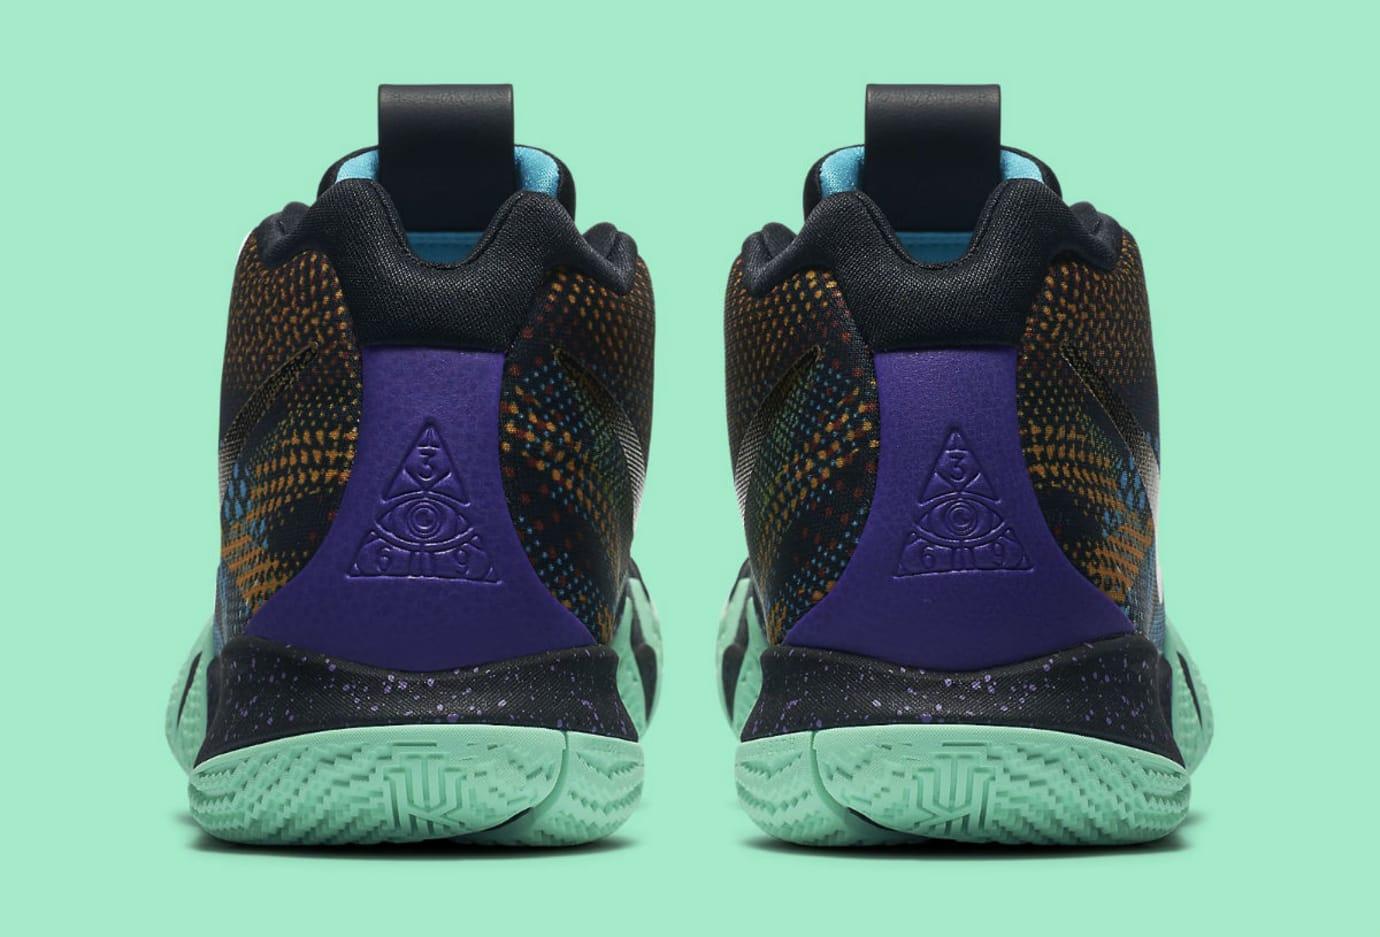 Nike Kyrie 4 Mamba Mentality Release Date AV2597-001 Heel 97972a5c5